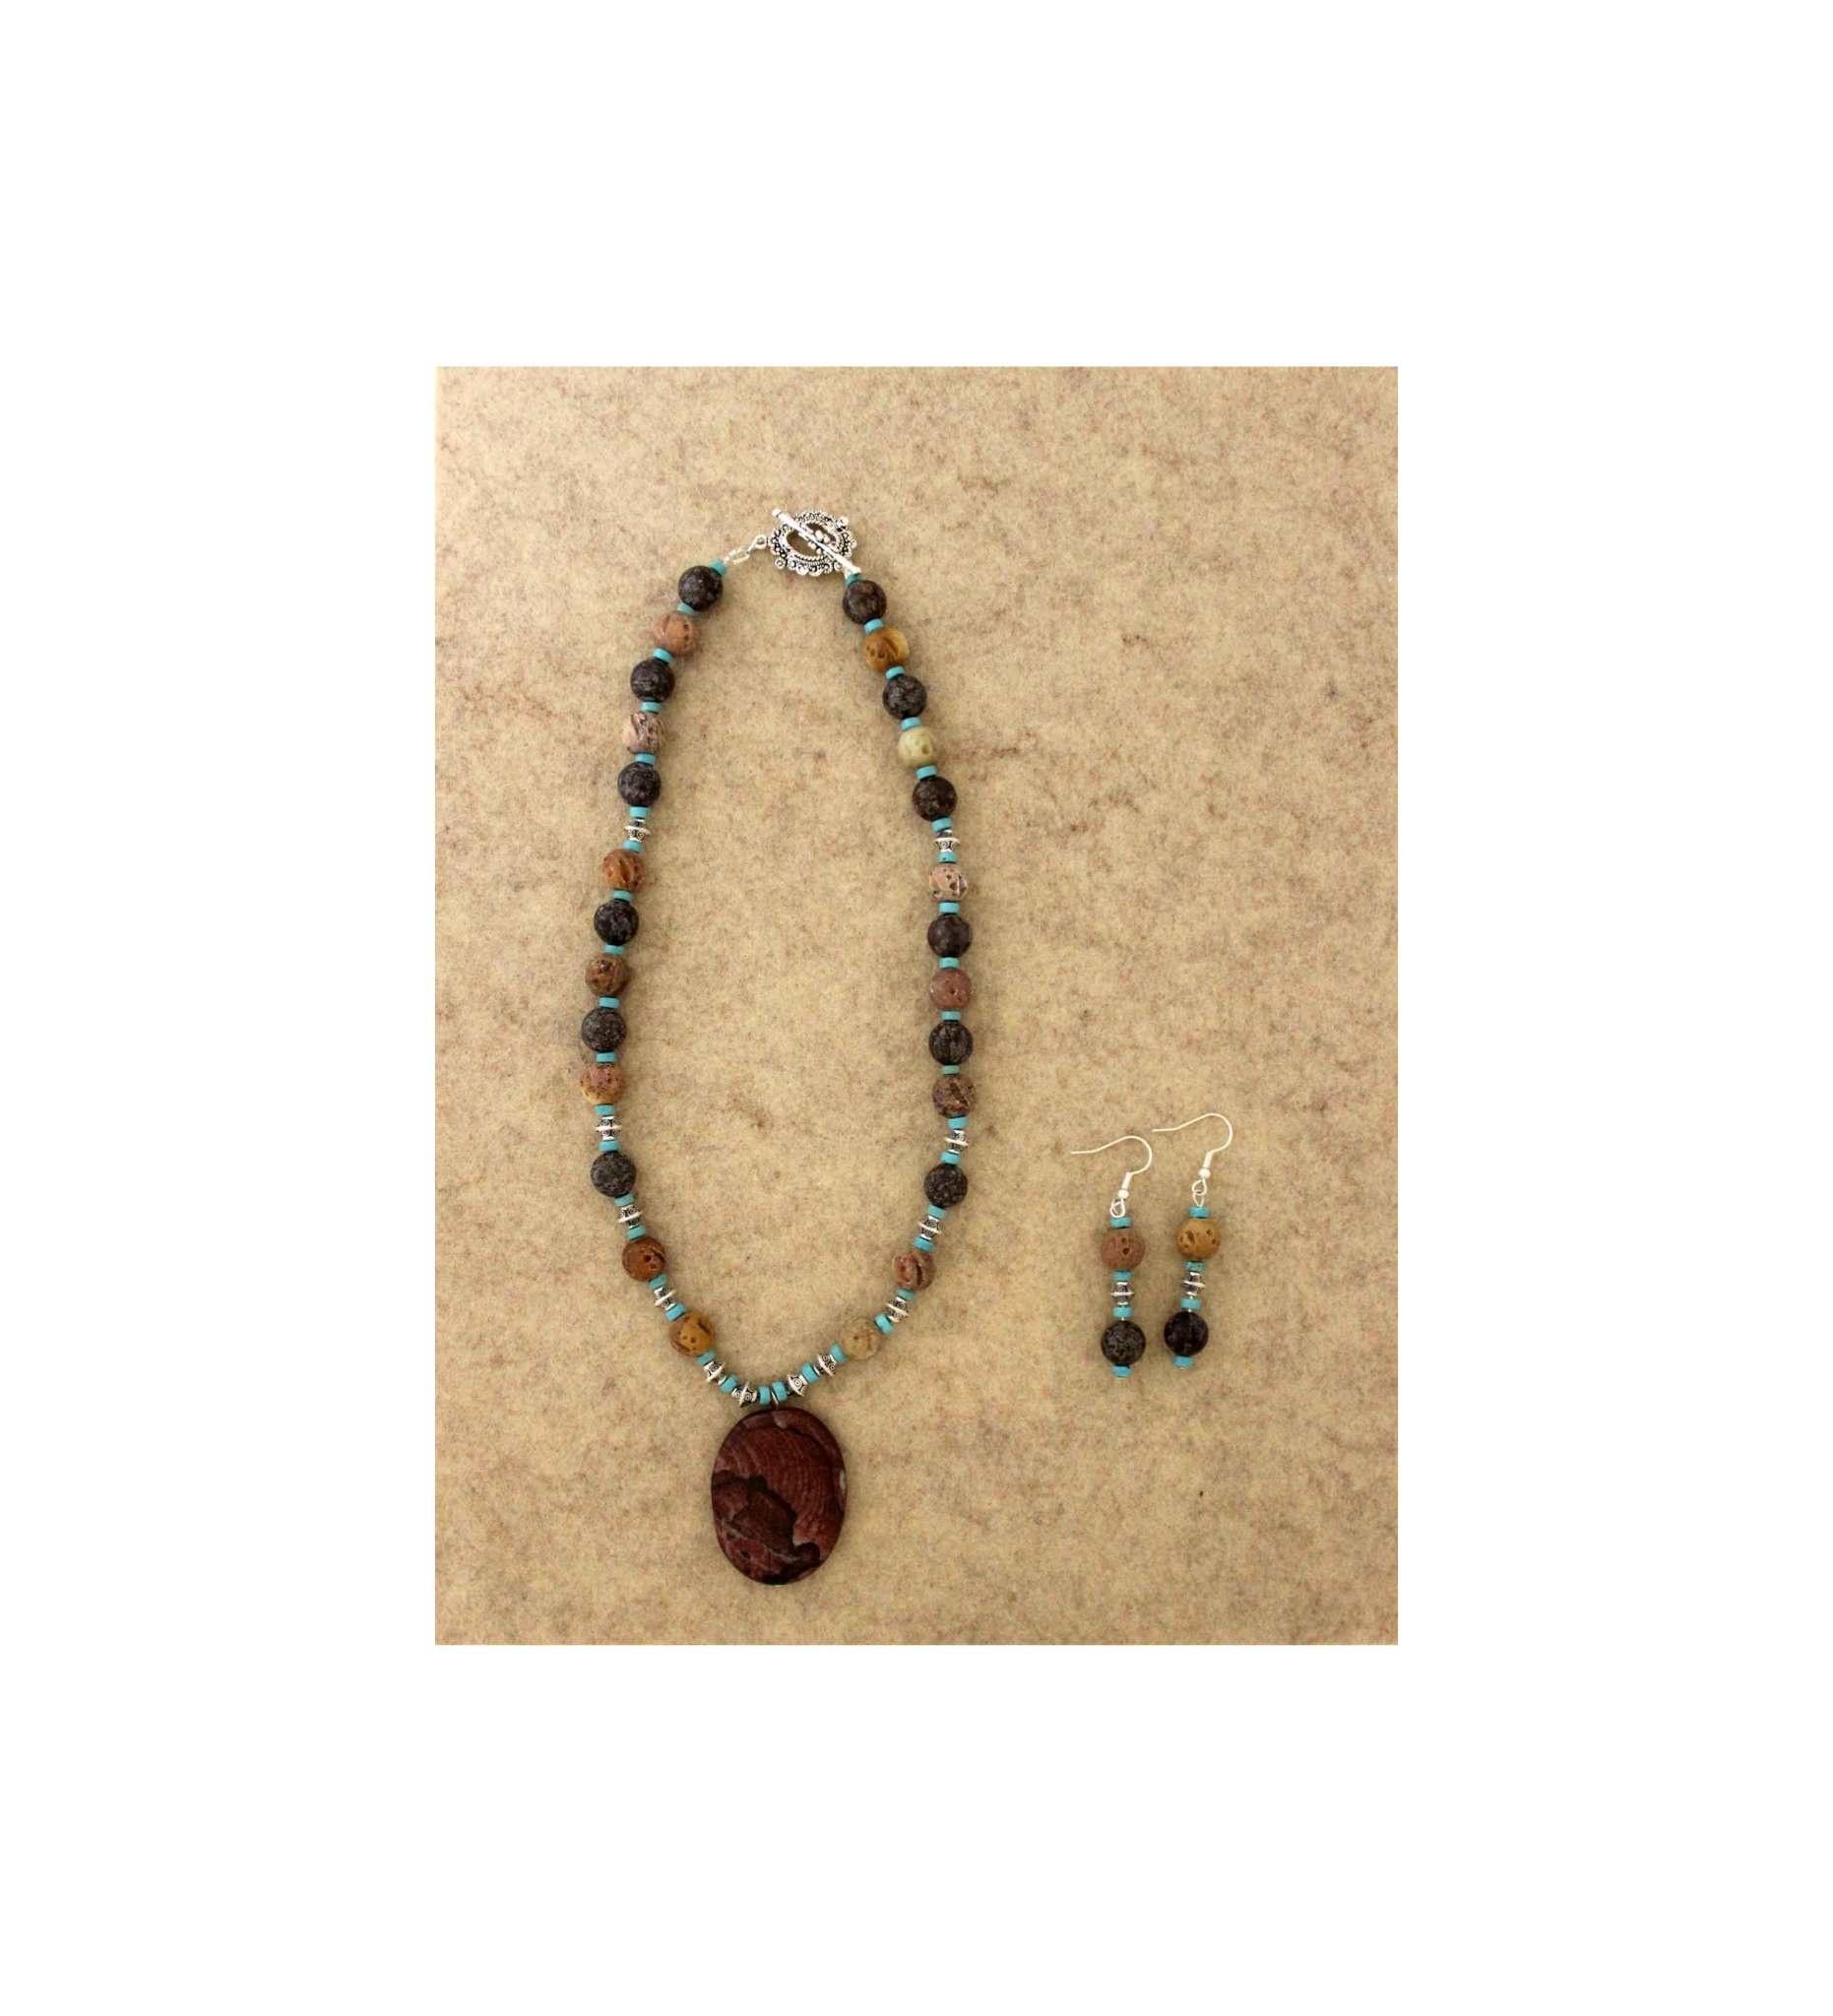 *JM 20191223205 Snowflake Obsidian & Wooden Beads & Jasper